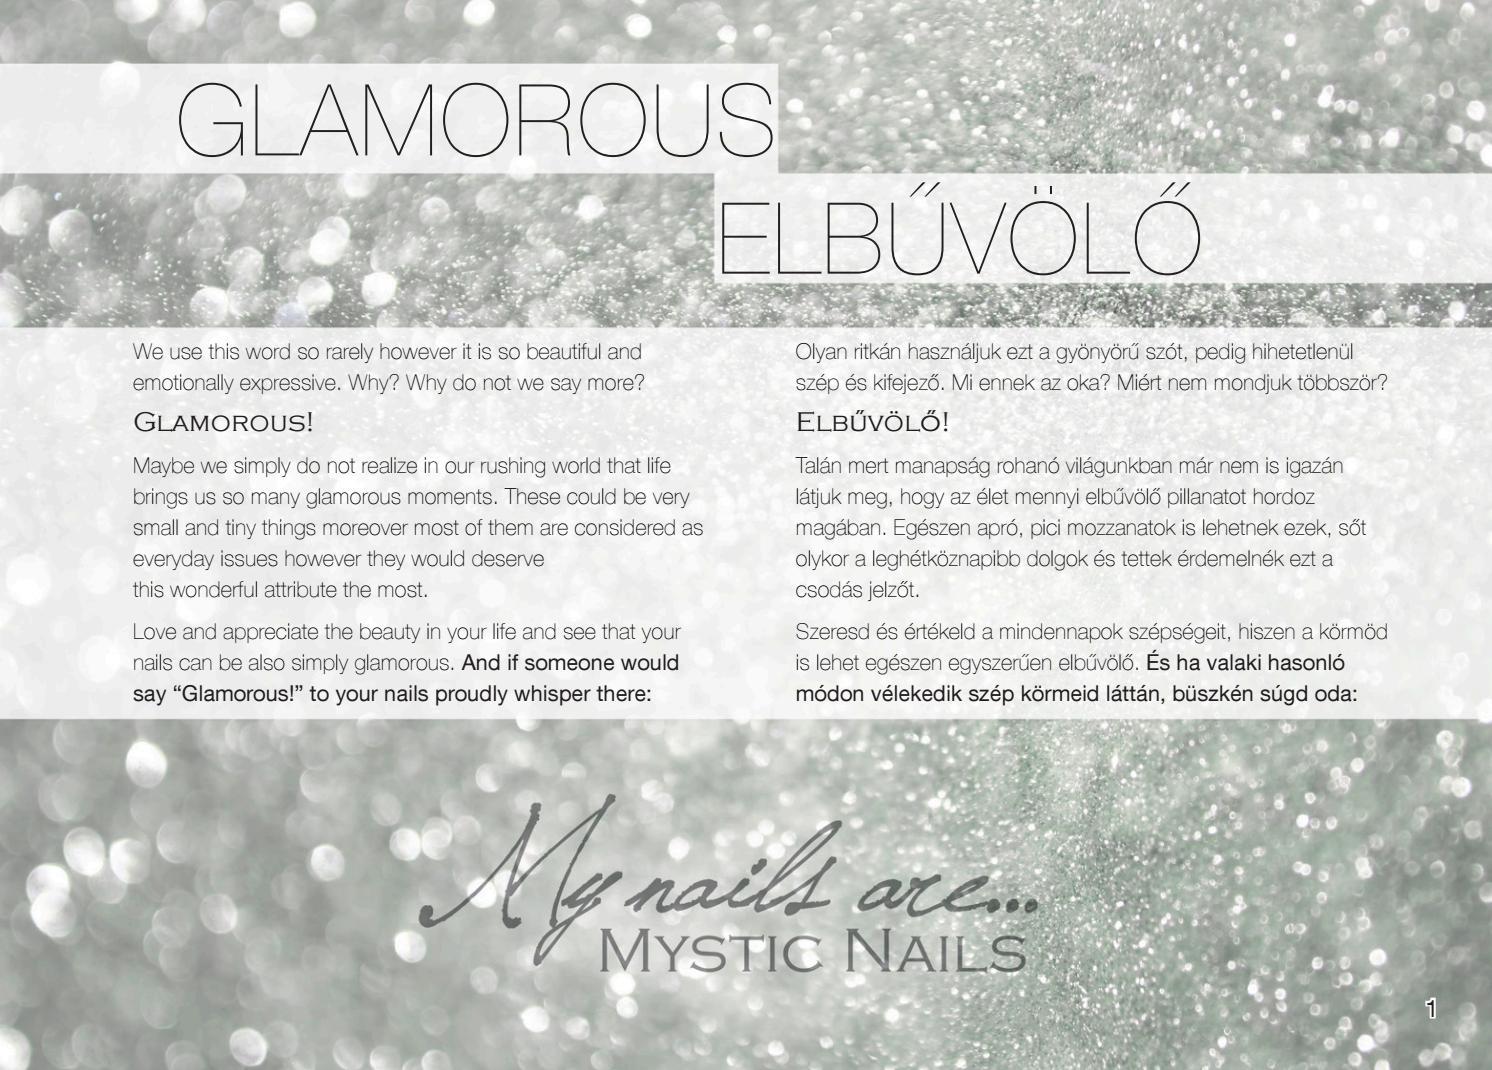 6a81b047de Catalogue 2016 hu en 2016 május belív issuura by Mystic Nails - issuu